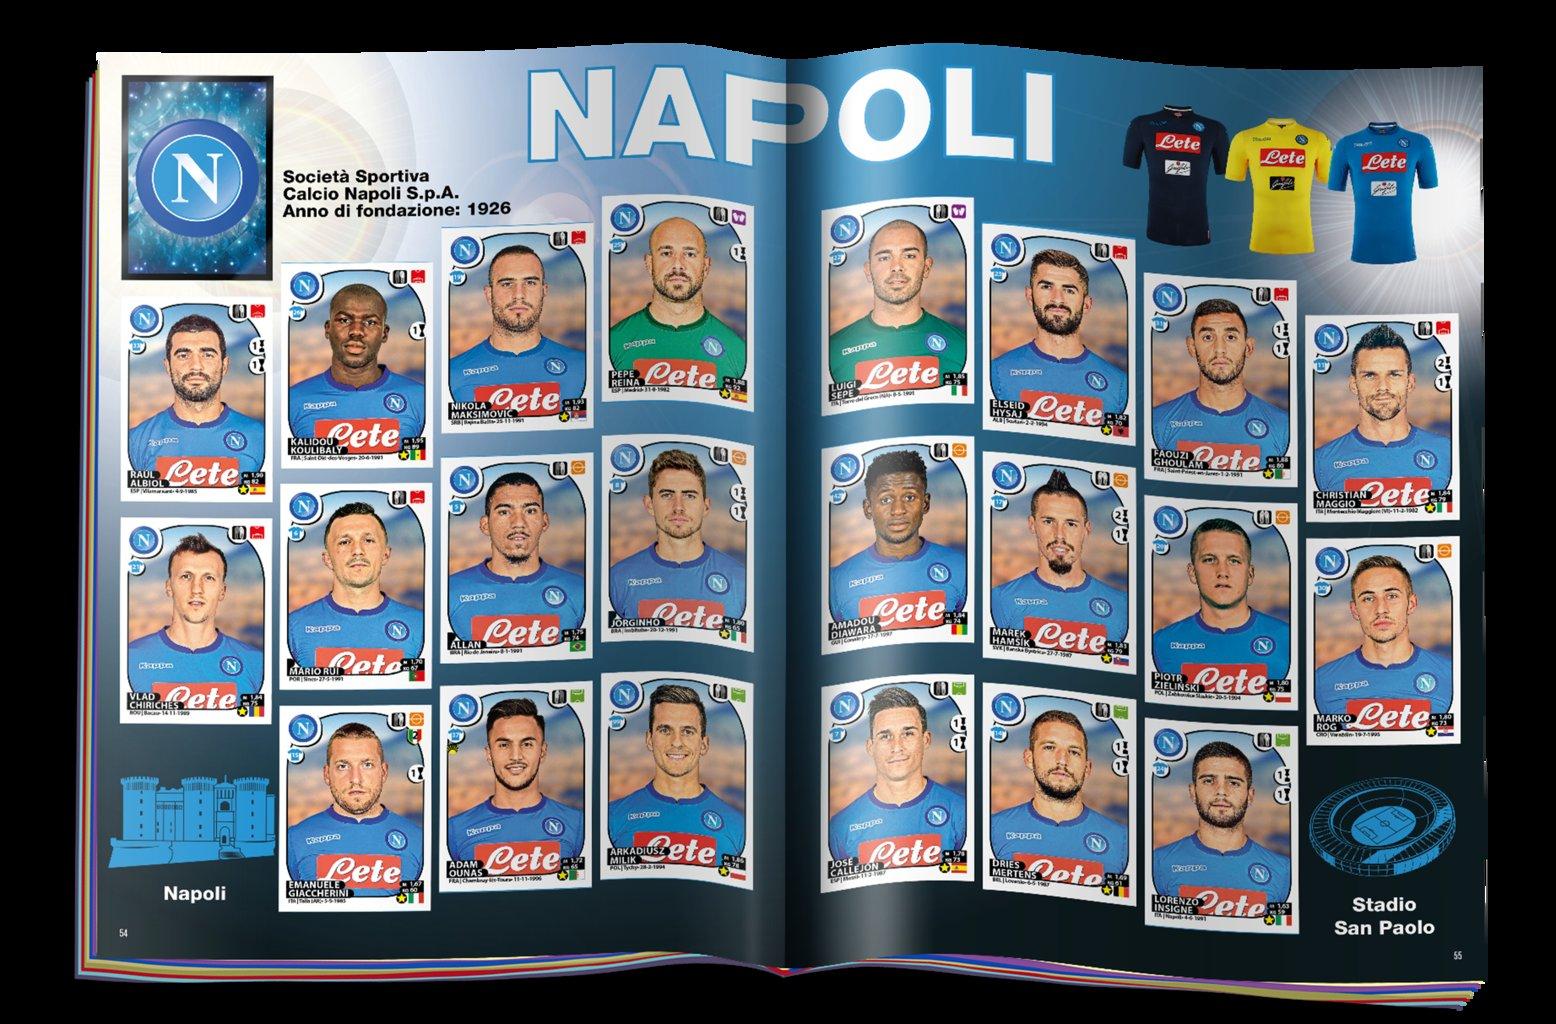 Napoli p1-2-Calciatori-Panini-2017-2018 (FILEminimizer)